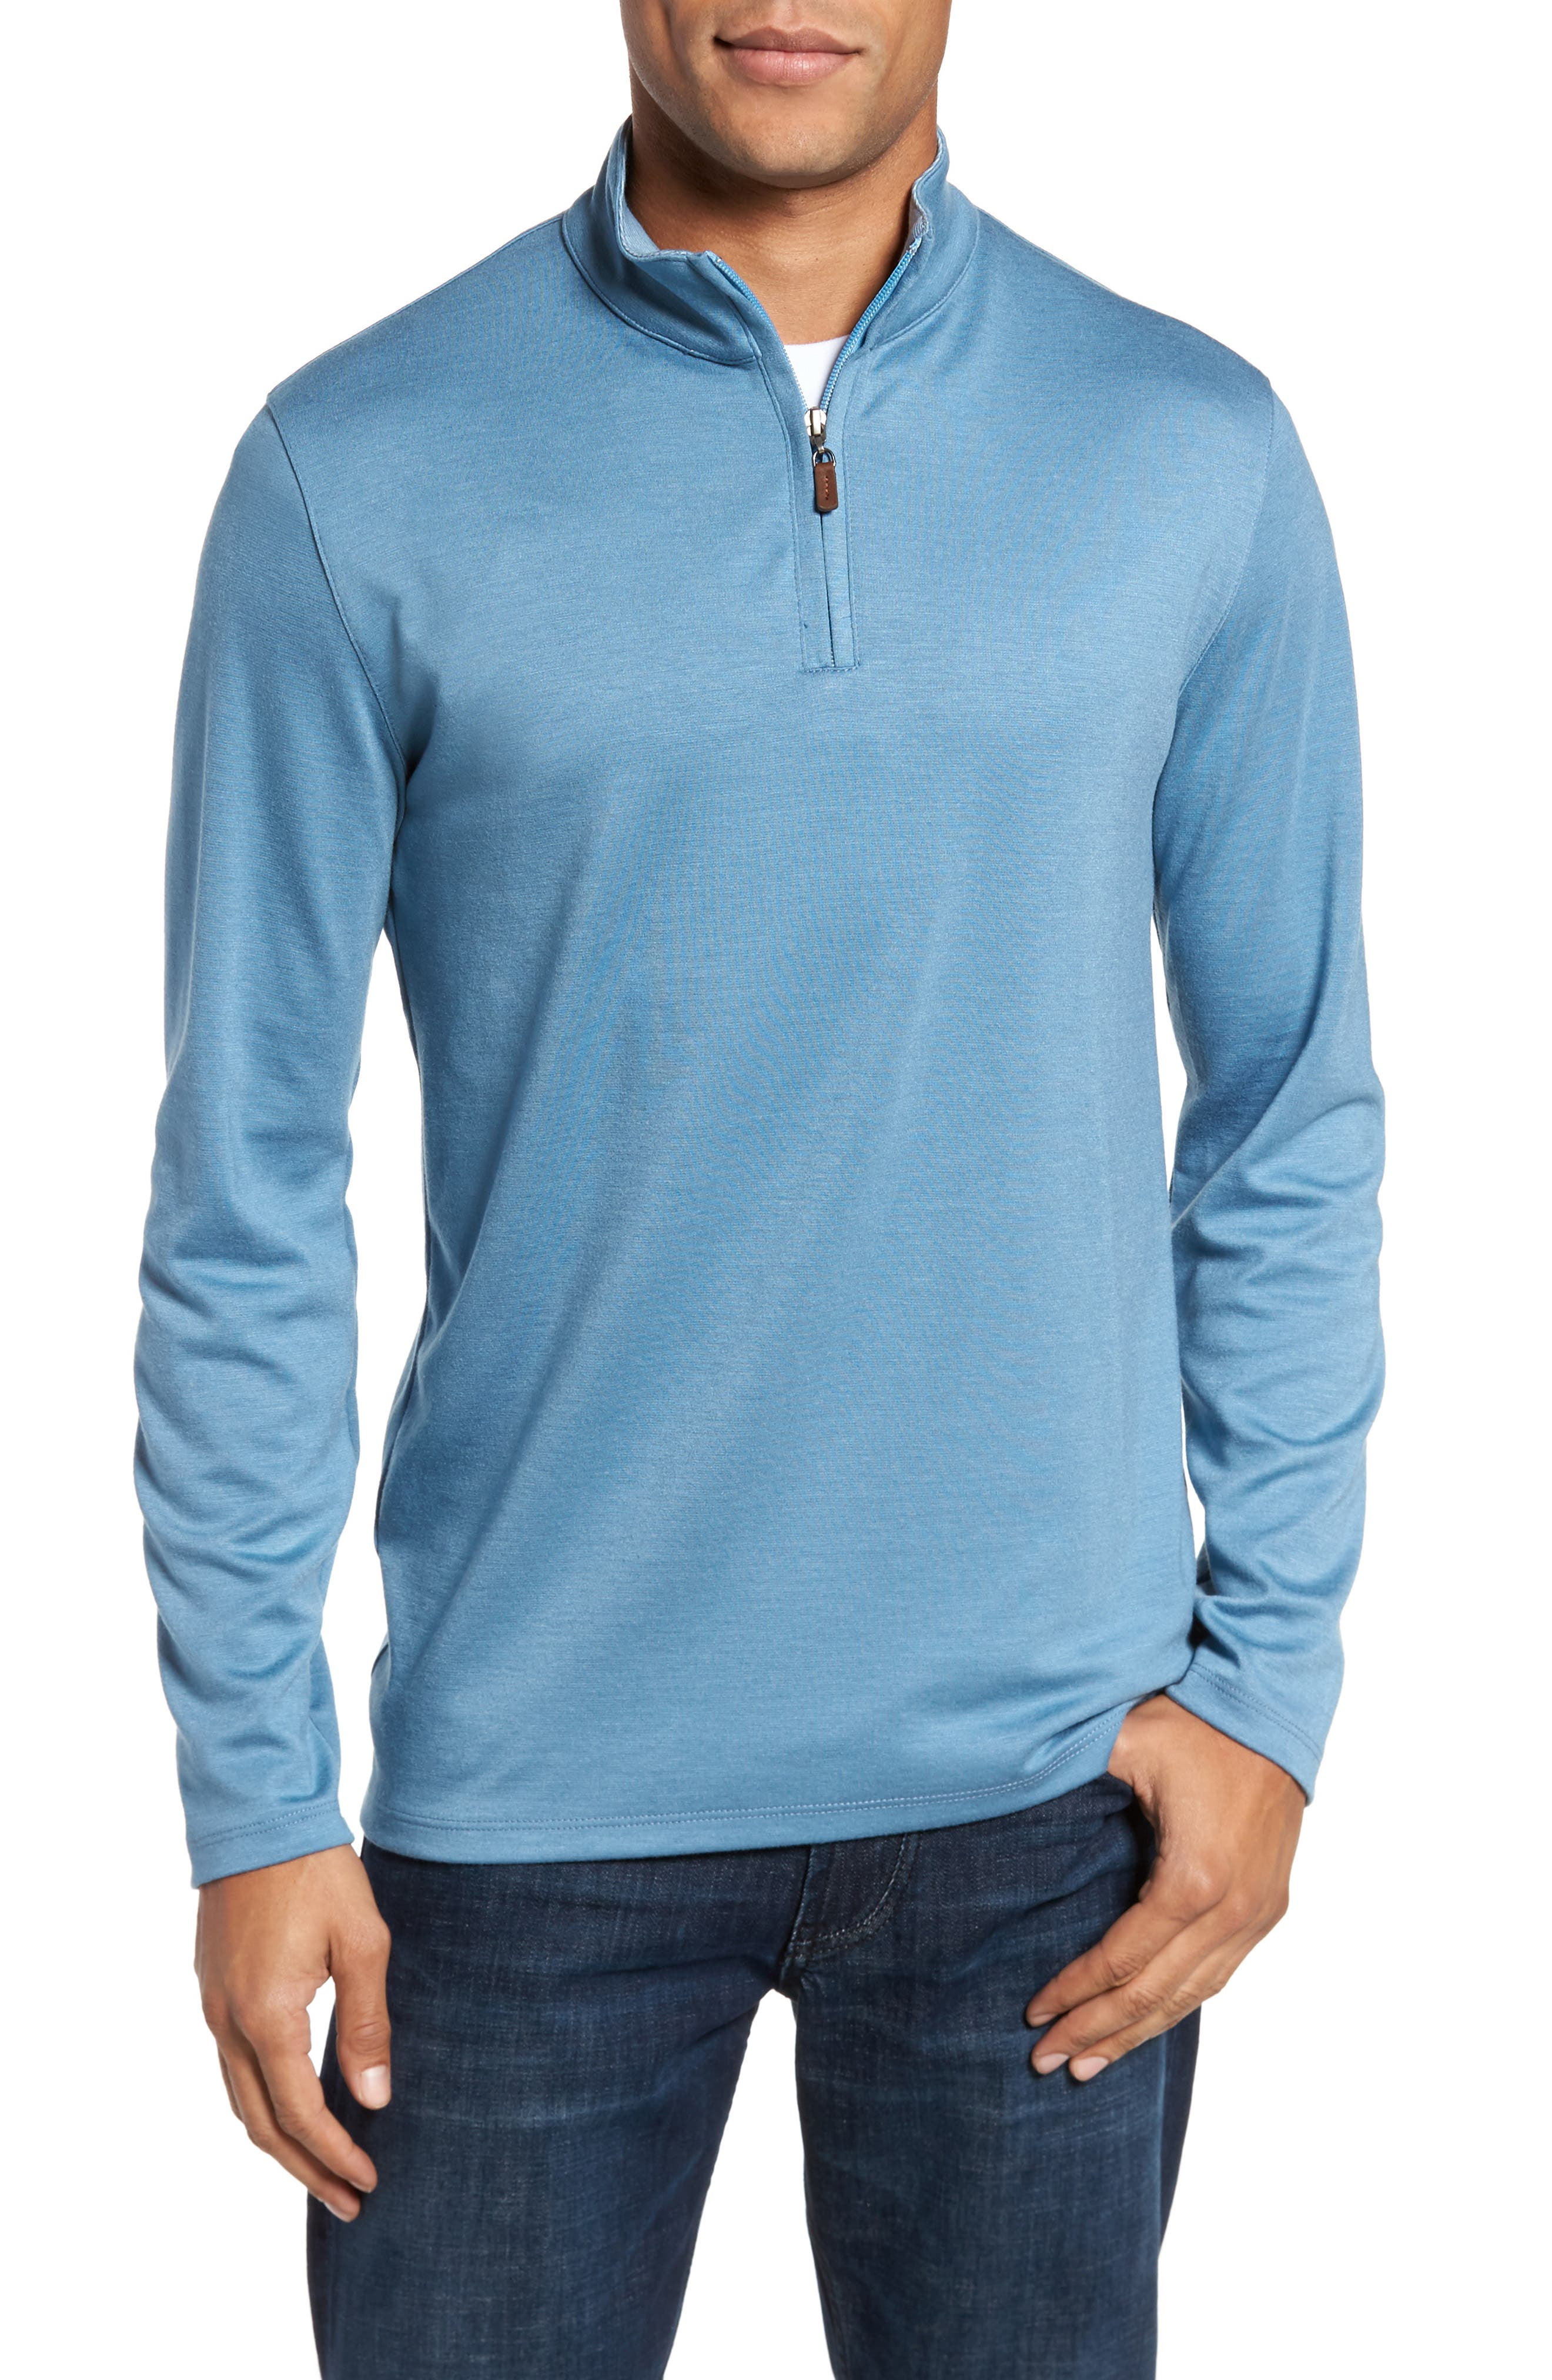 Quarter Zip Pullover,                         Main,                         color, Blue